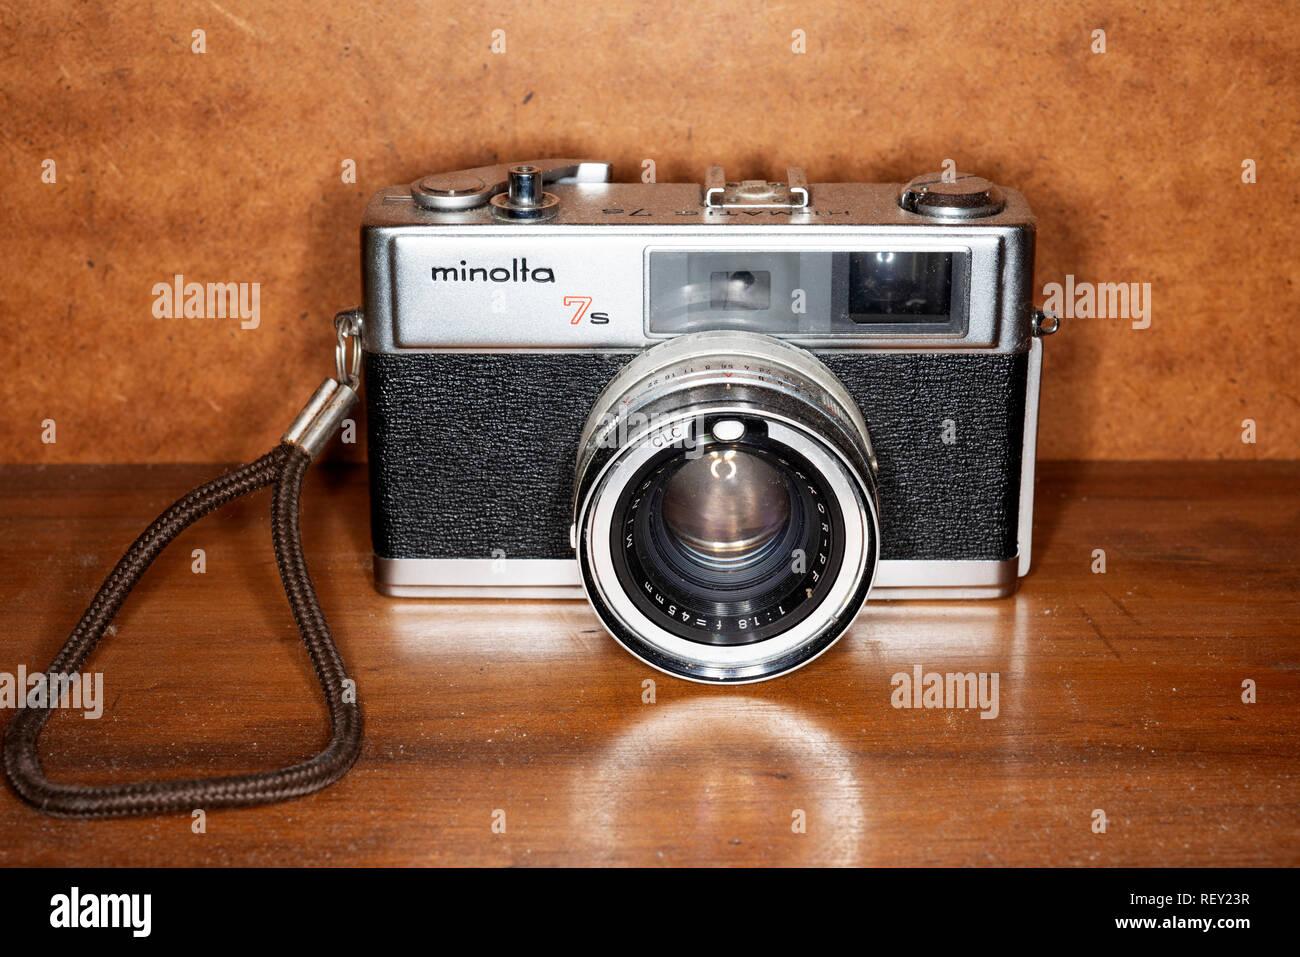 Minolta 7s 35mm rangefinder camera - Stock Image